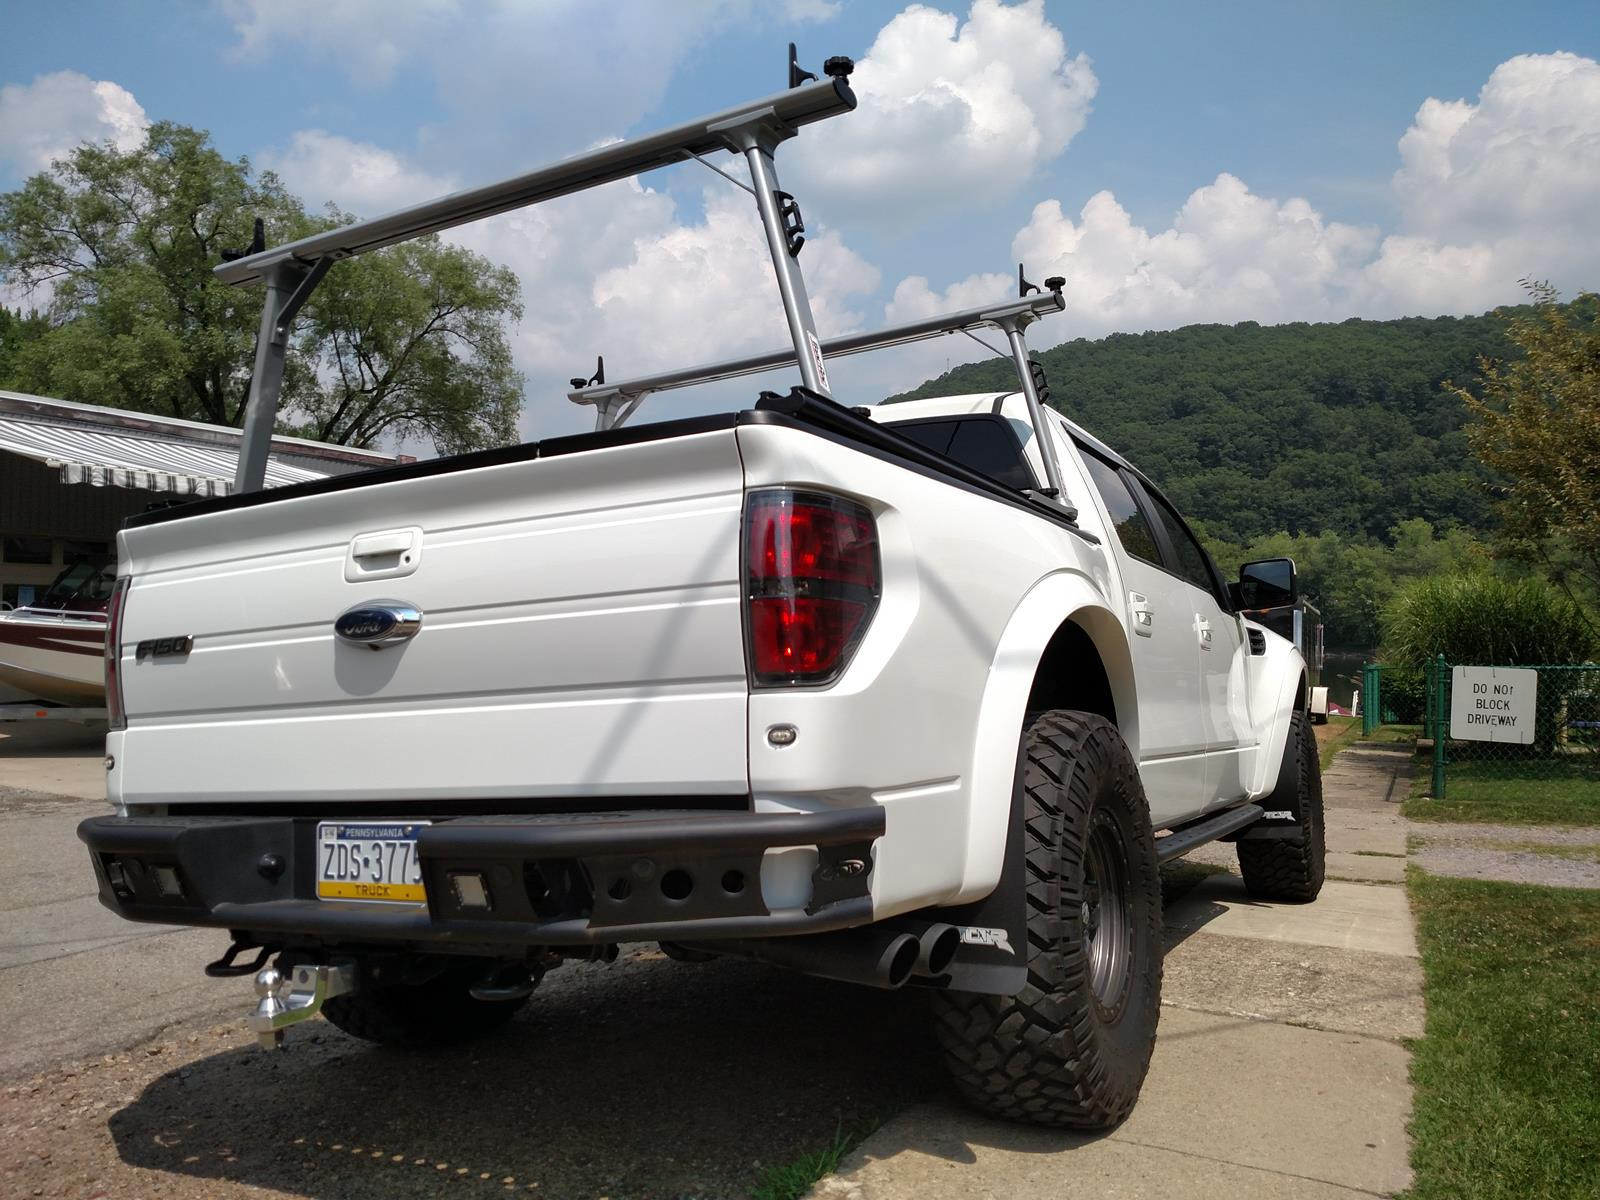 Retrax Tonneau Cover >> RevolverX4 Hard Rolling Tonneau Cover + Thule TracRac SR Truck Bed Rack System